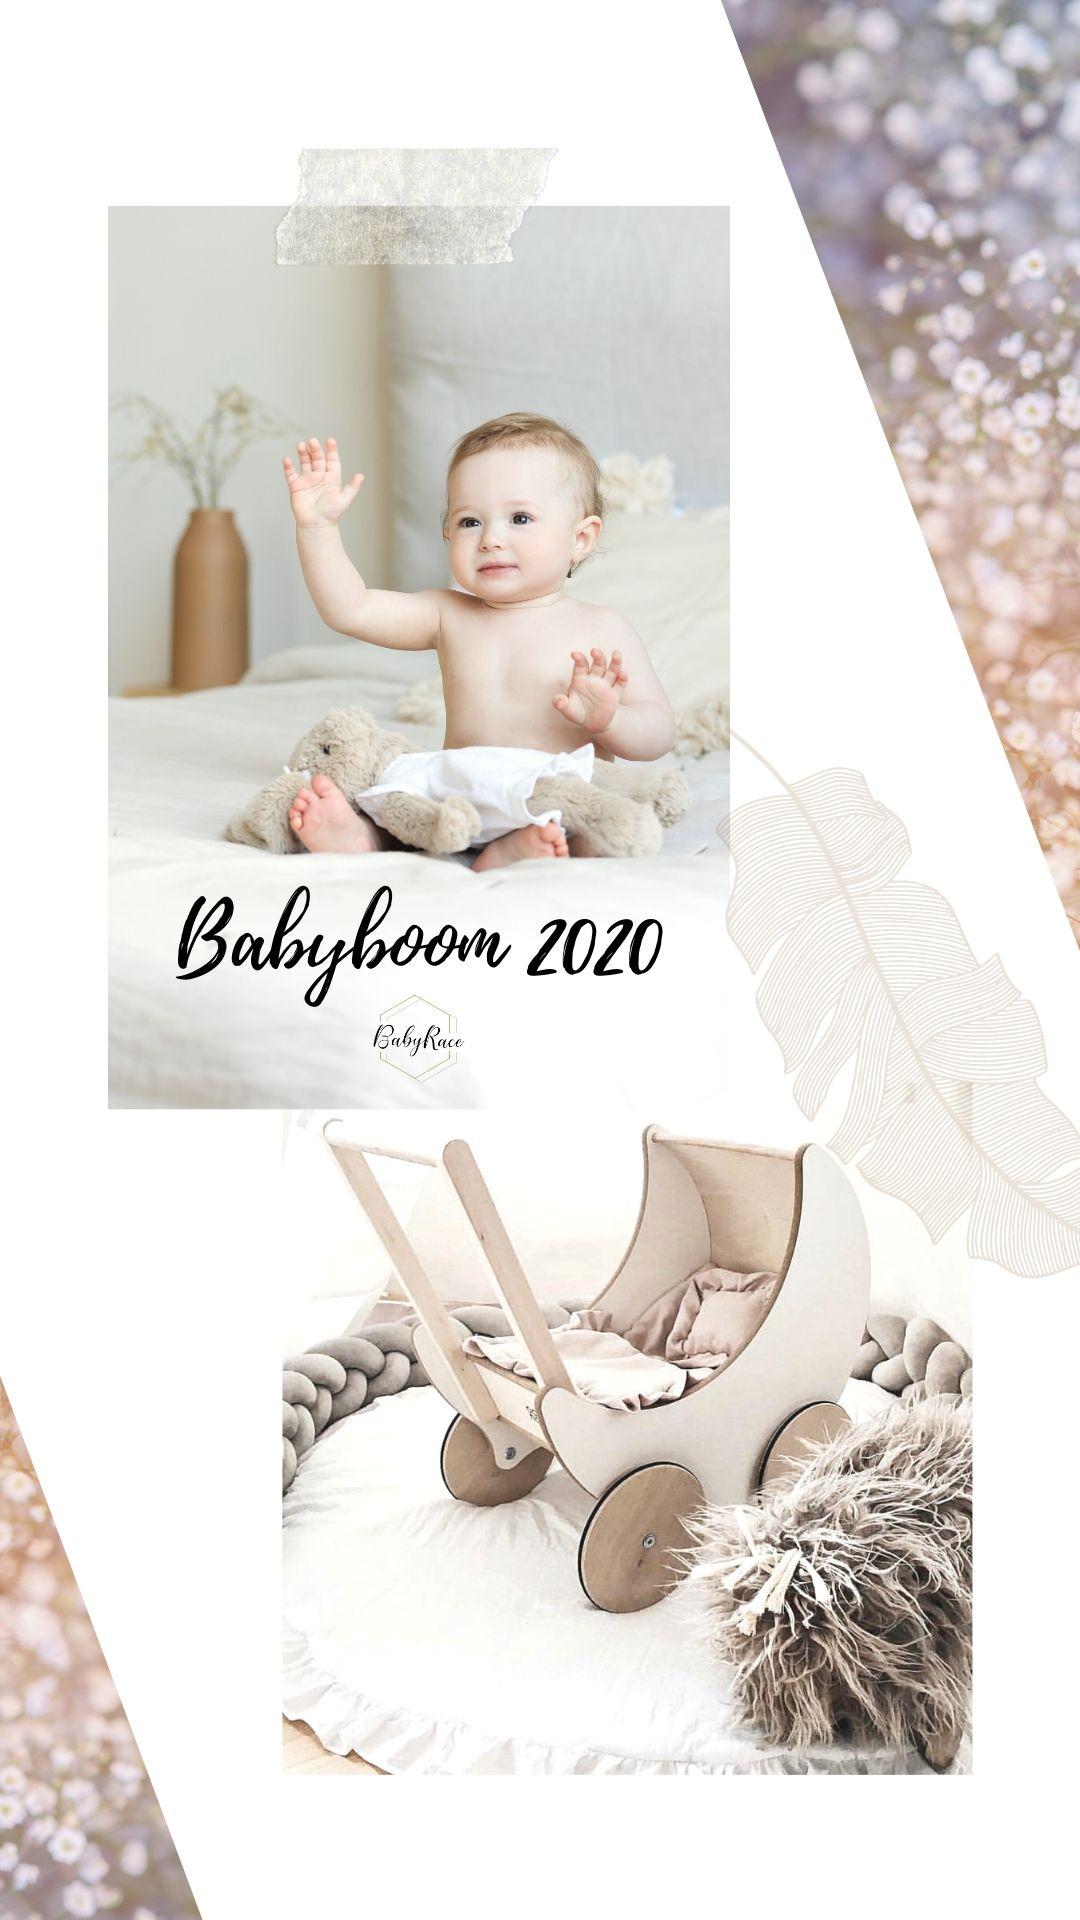 Babyboom 2020